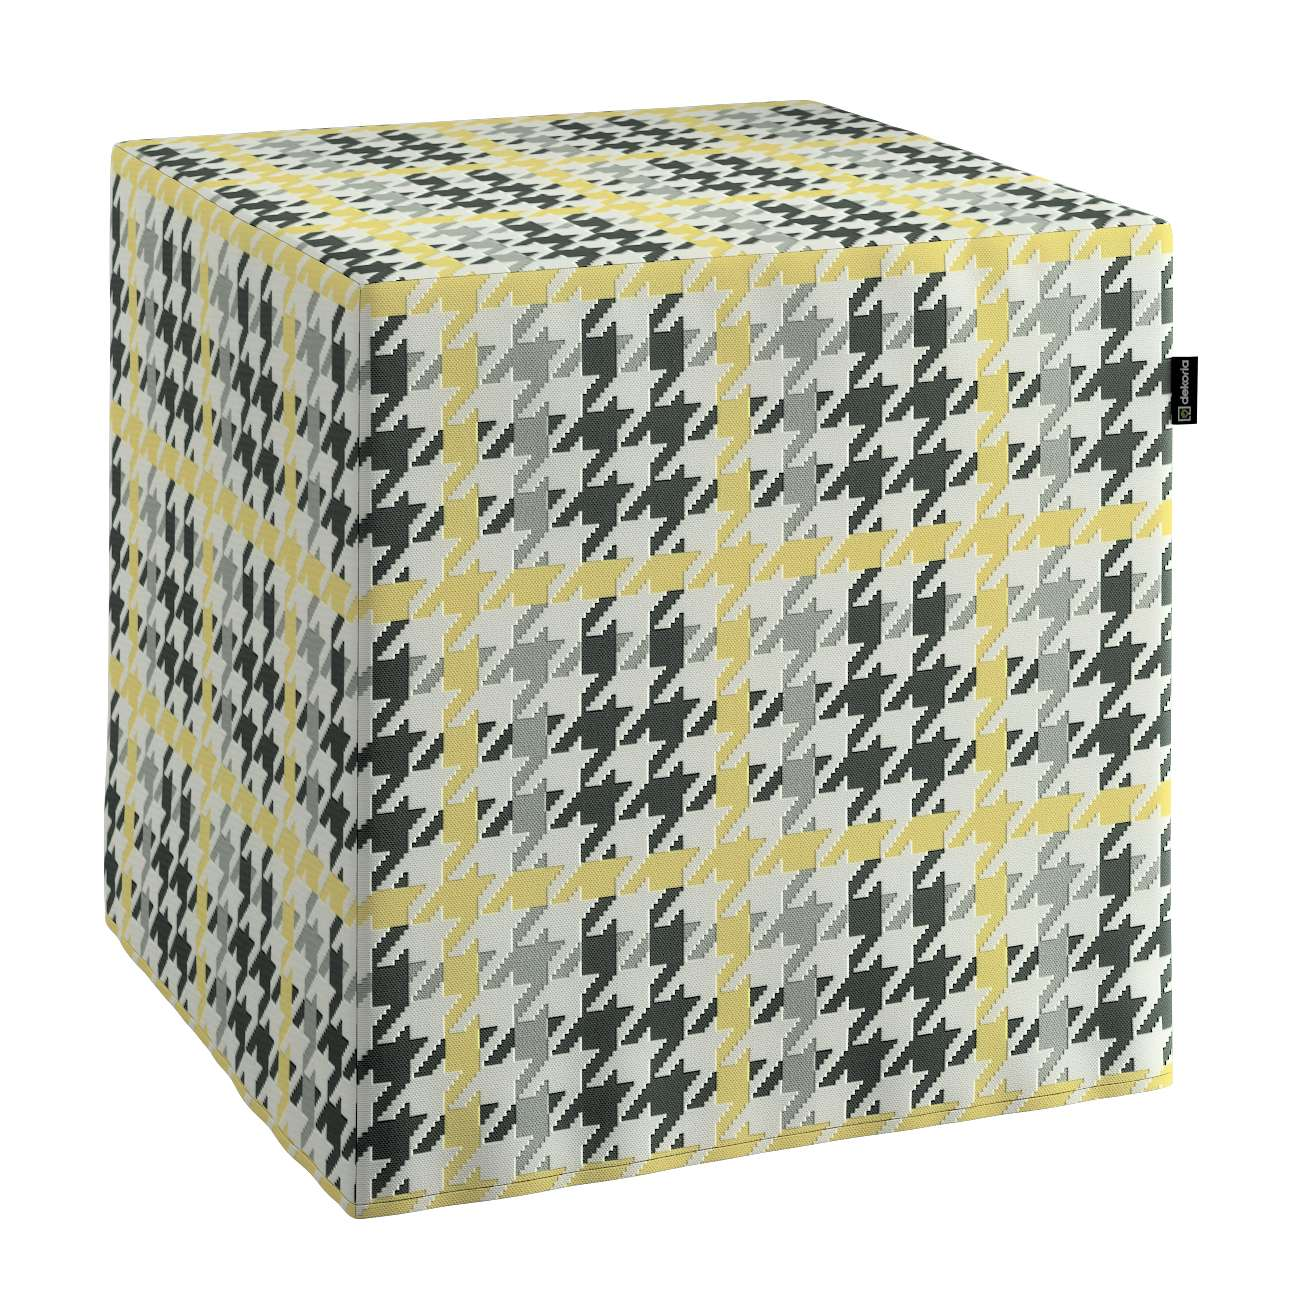 Sedák Cube - kostka pevná 40x40x40 v kolekci Brooklyn, látka: 137-79